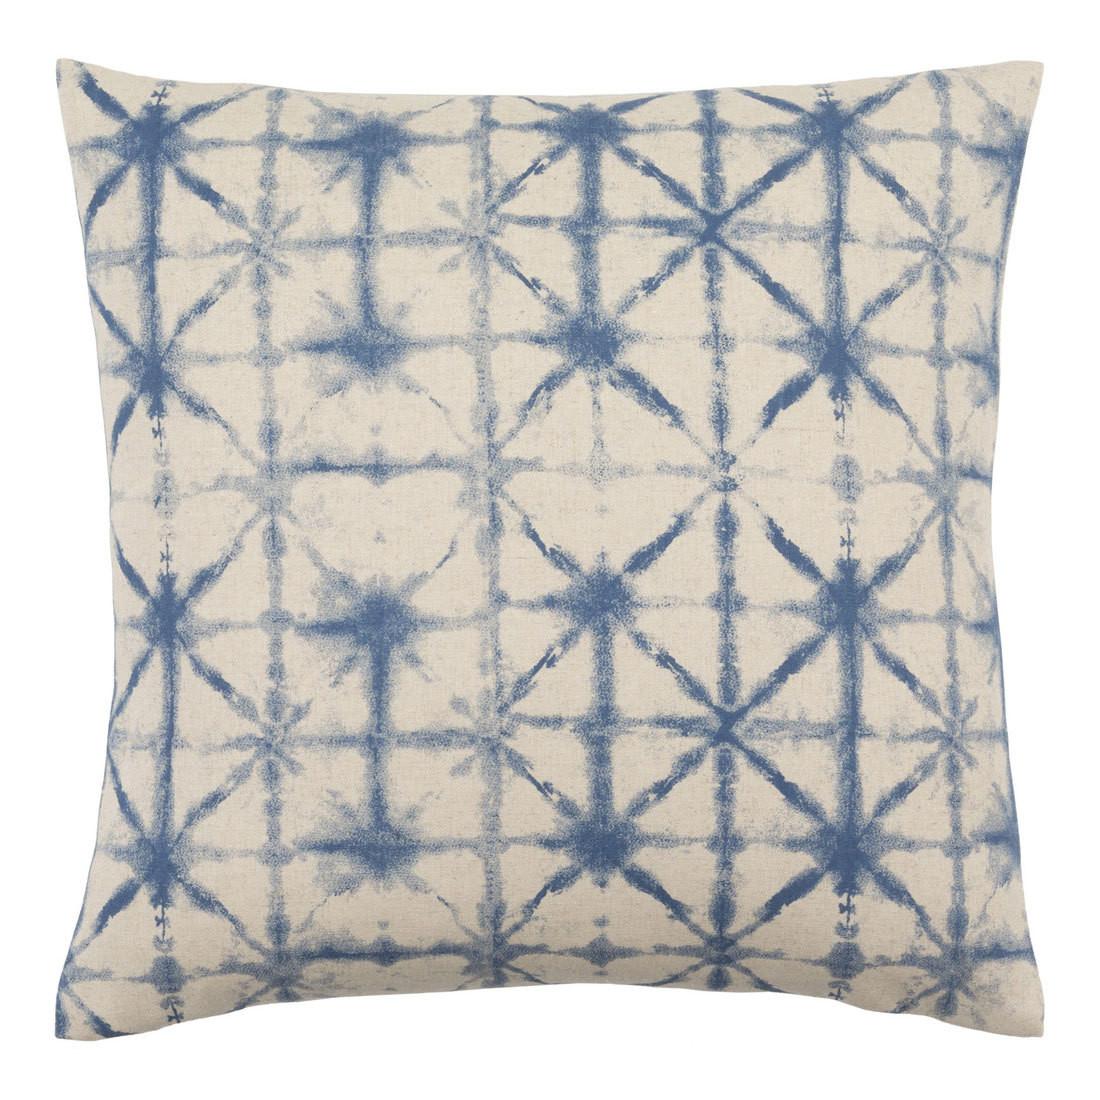 Arimatsu Pillow - NEB-003 18 x 18 inches Polyester, Linen Blue